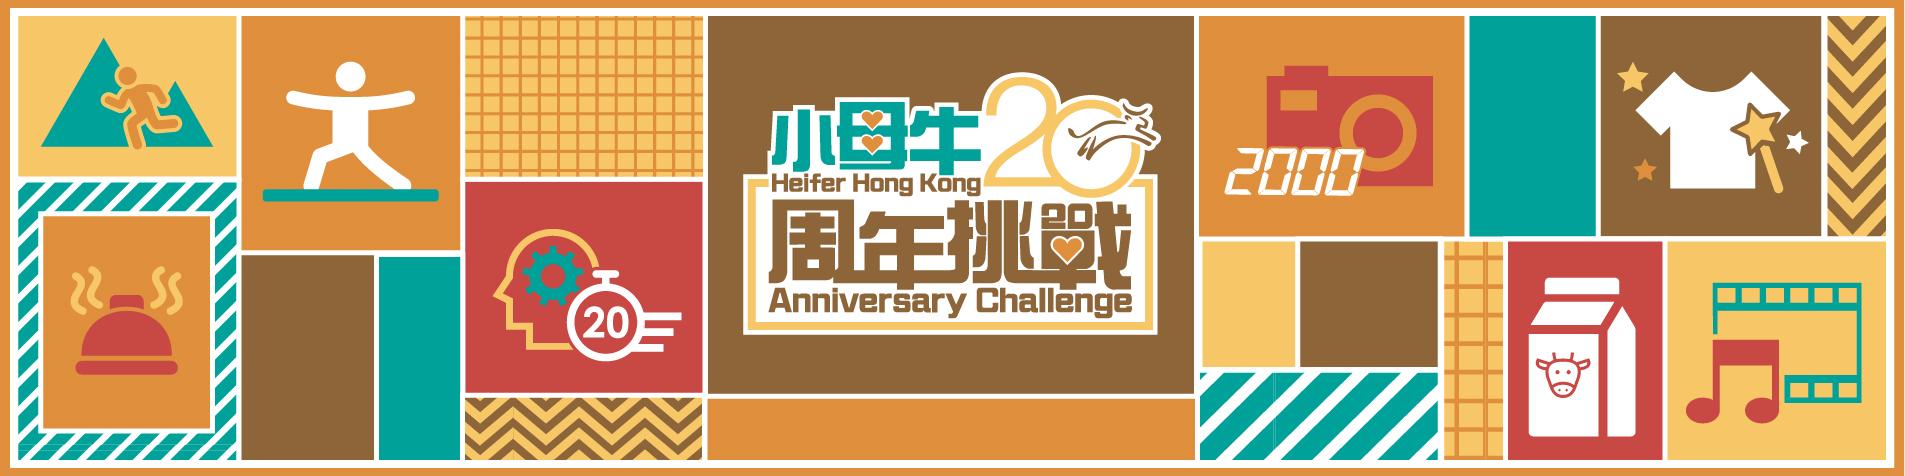 Heifer Hong Kong 20th Anniversary Challenge